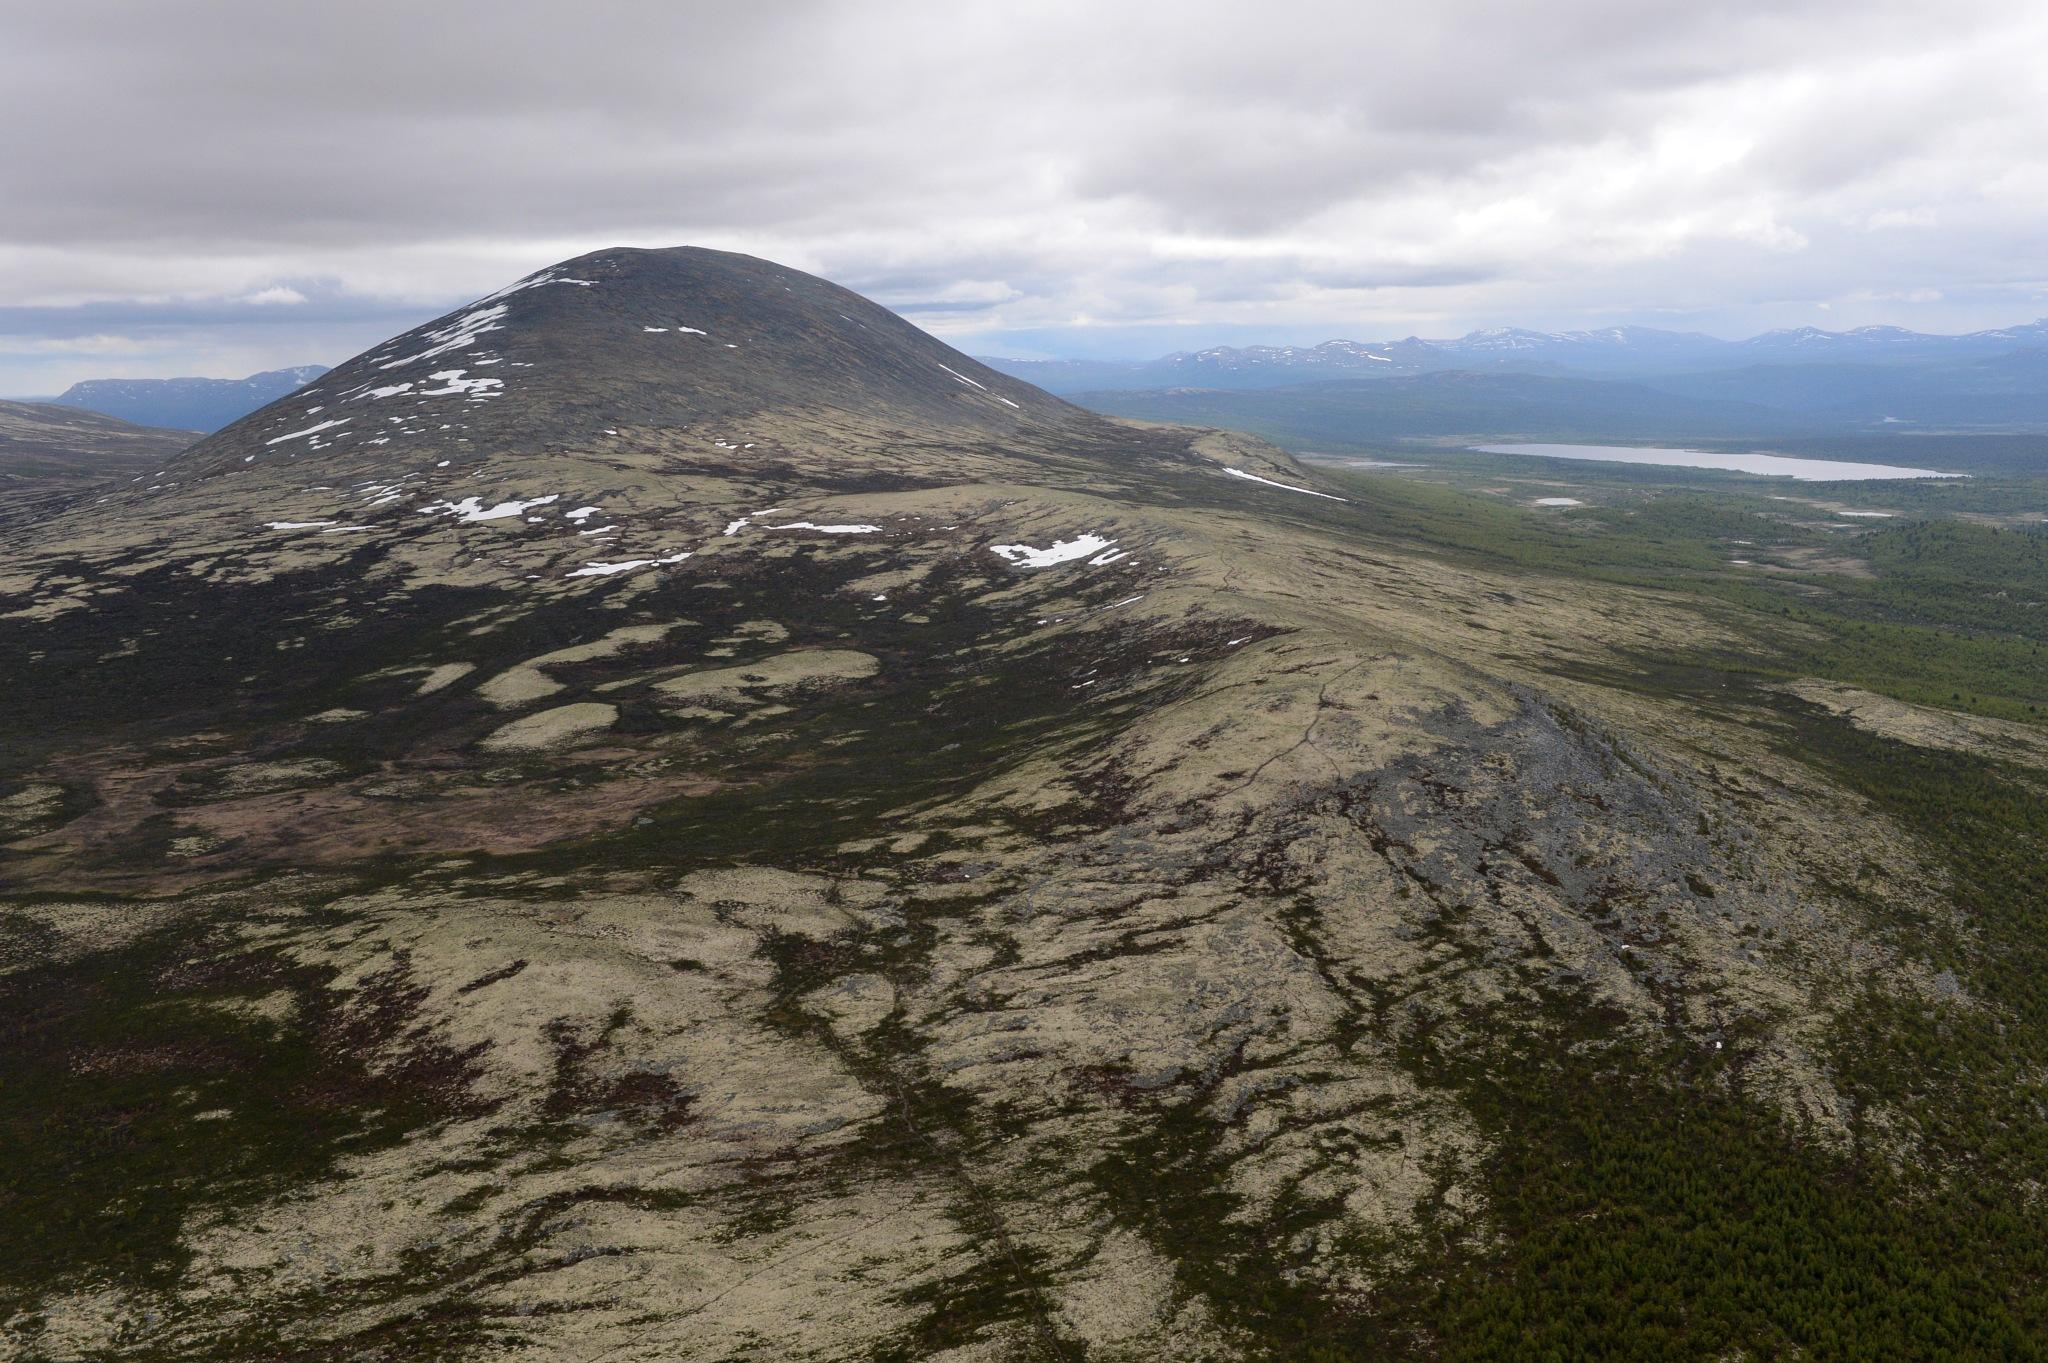 Litt Norge by Lasse Tur